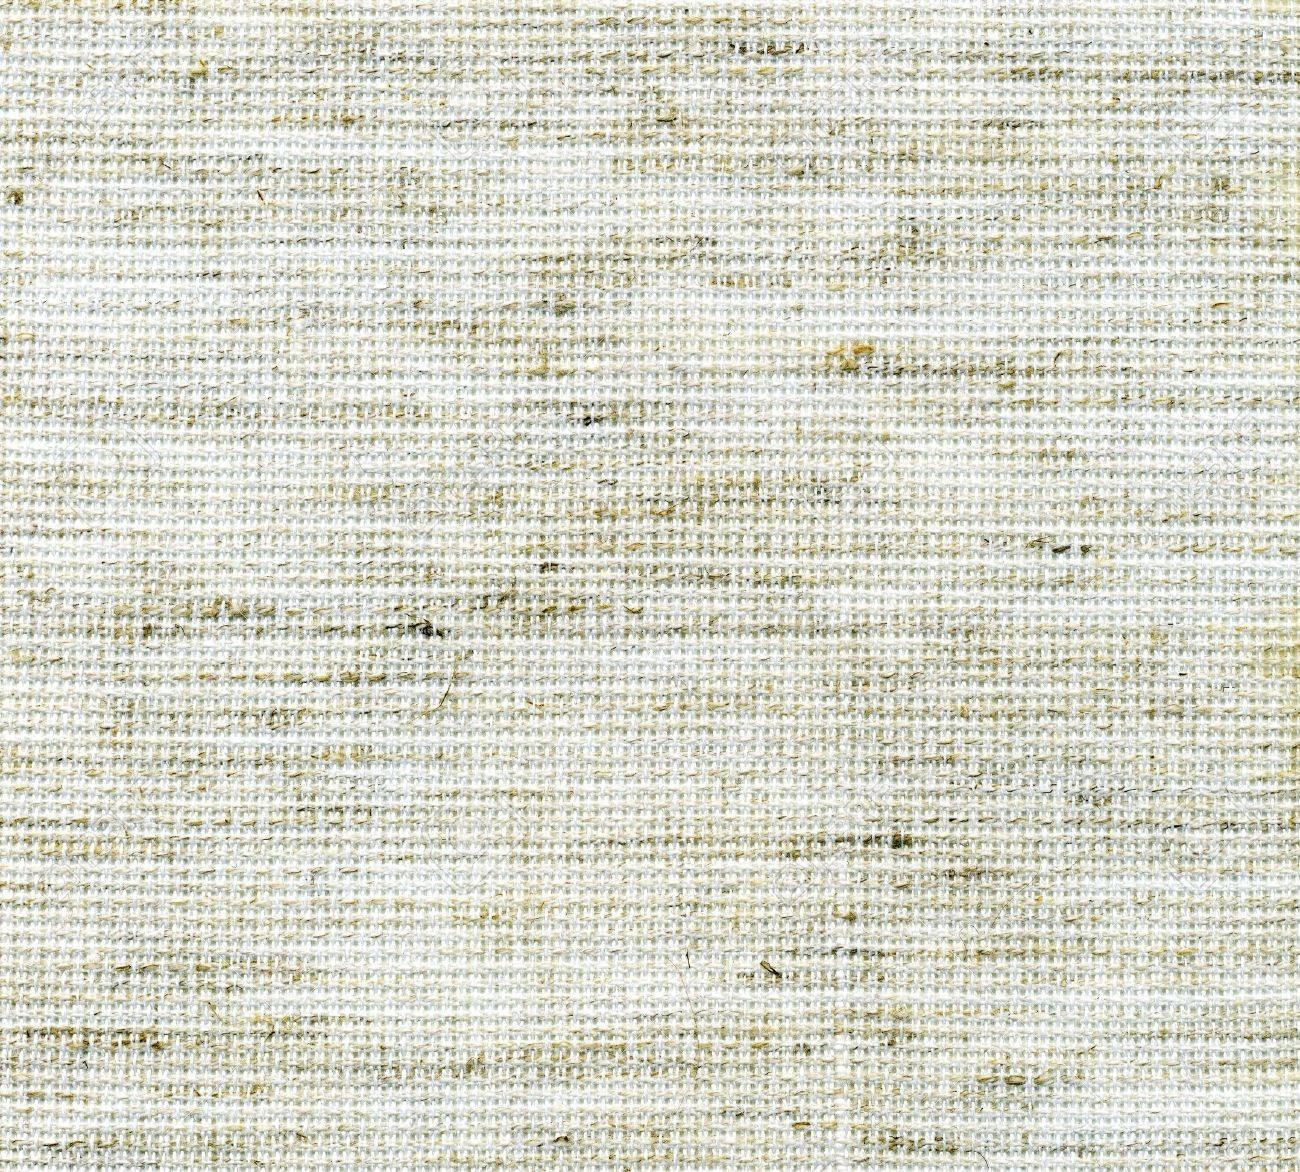 grey invoice flax fabric wickerwork texture background Stock Photo - 5048017